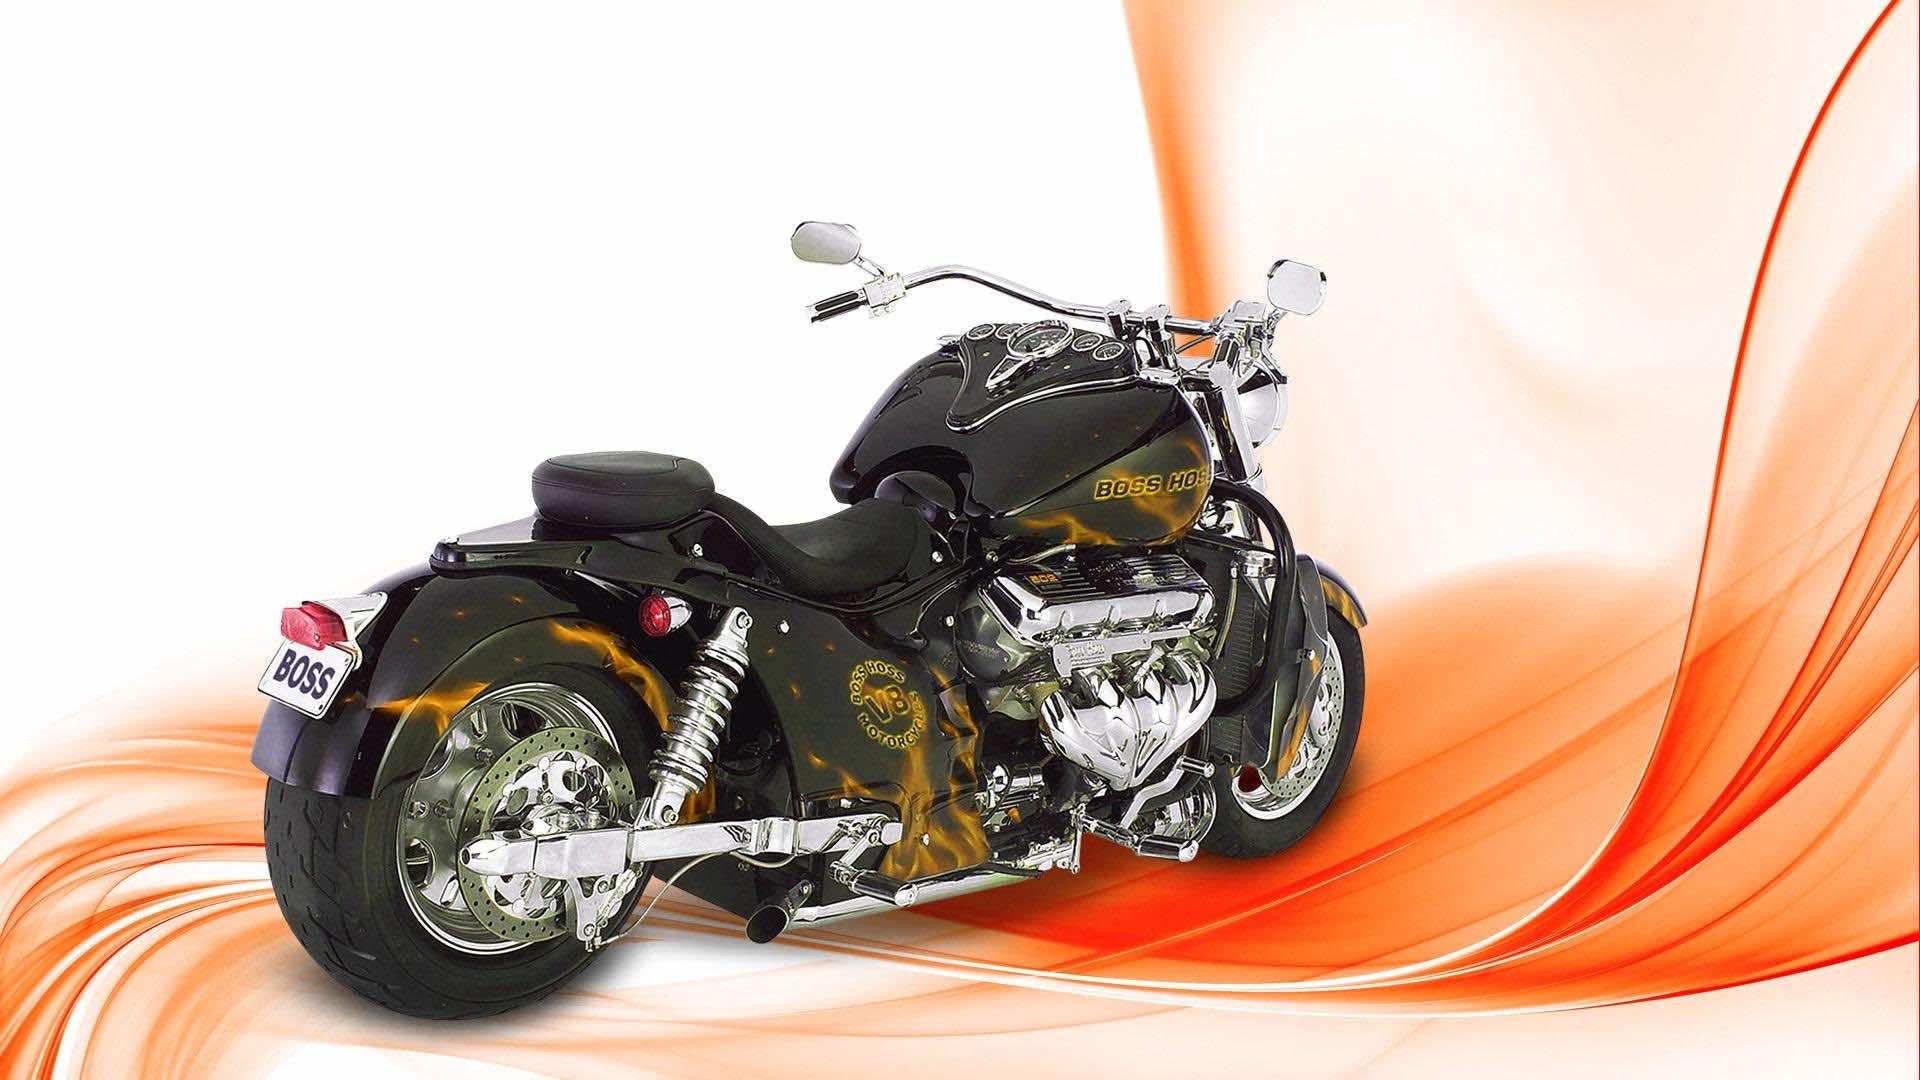 Hd Electric Bike Images Bike Hd Wallpapers 1920x1080: 35 HD Bike Wallpapers For Desktop Free Download